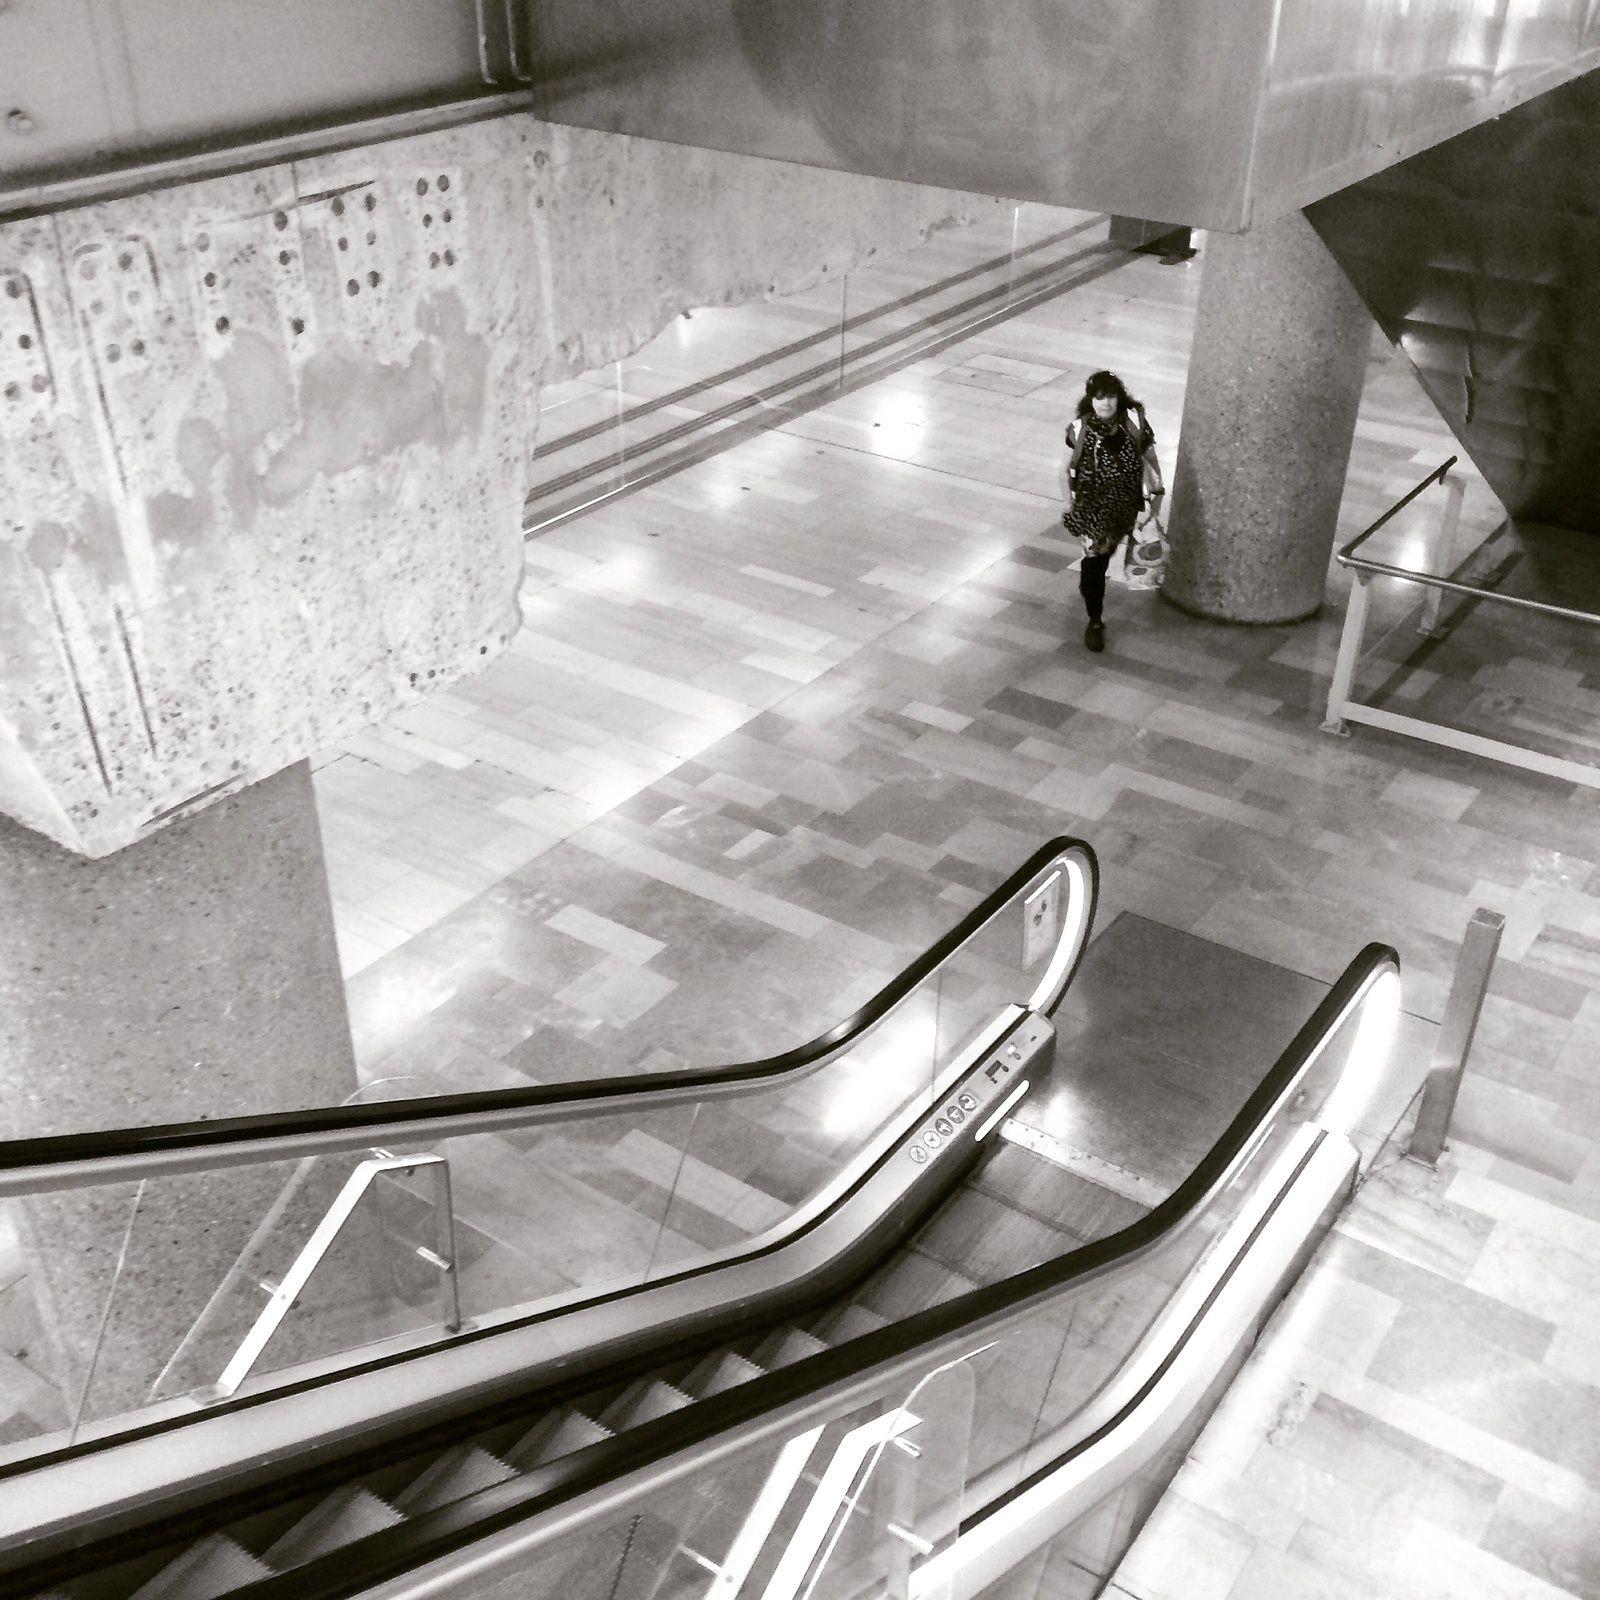 Noir &amp&#x3B; Blanc \ Black &amp&#x3B; White #ivansigg